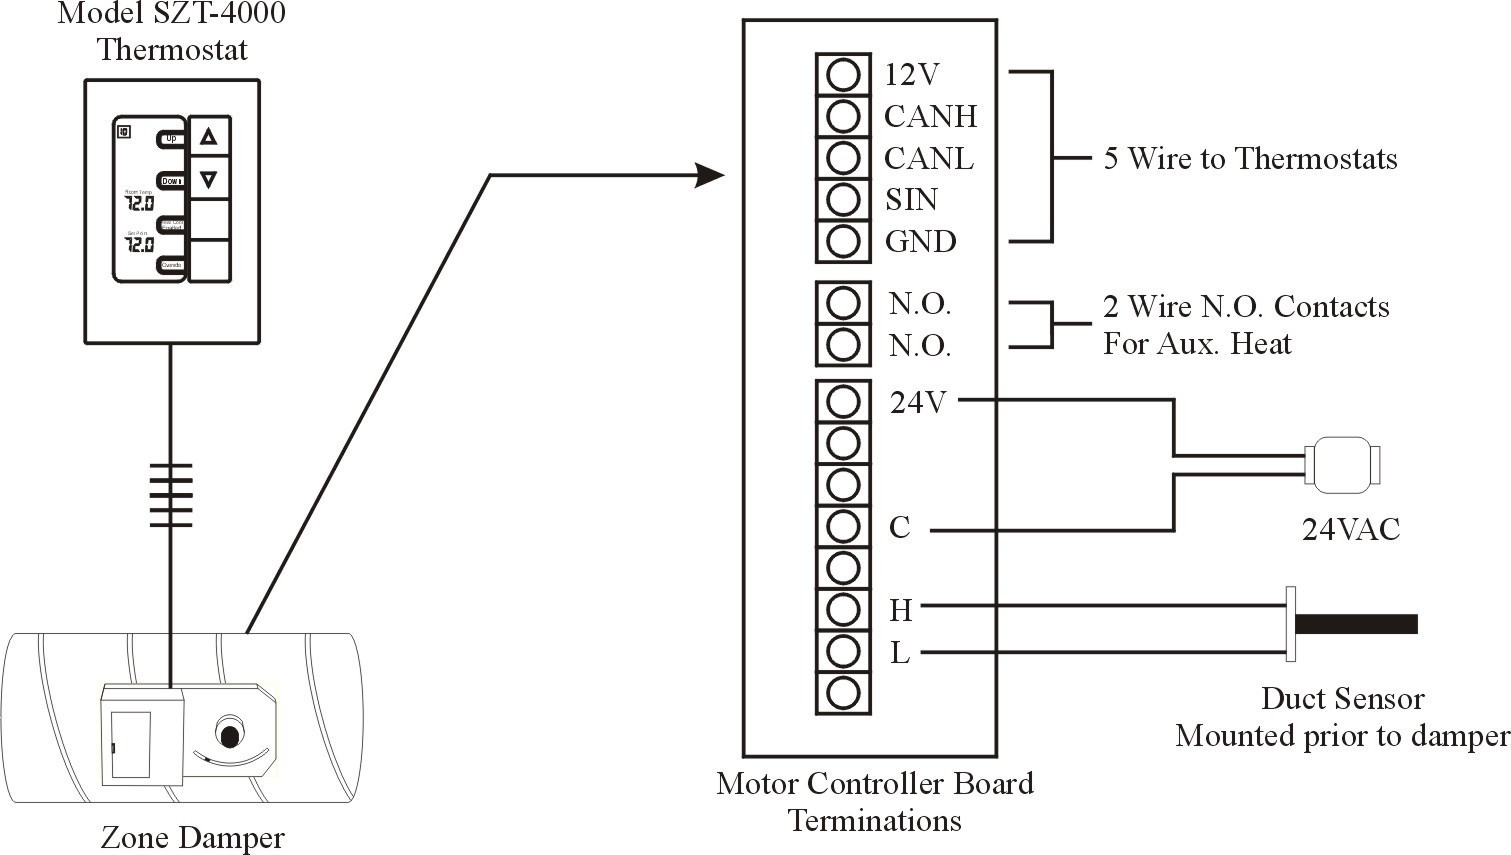 Smoke Detector 2151 Wiring Diagram | Manual E-Books - Smoke Detector Wiring Diagram